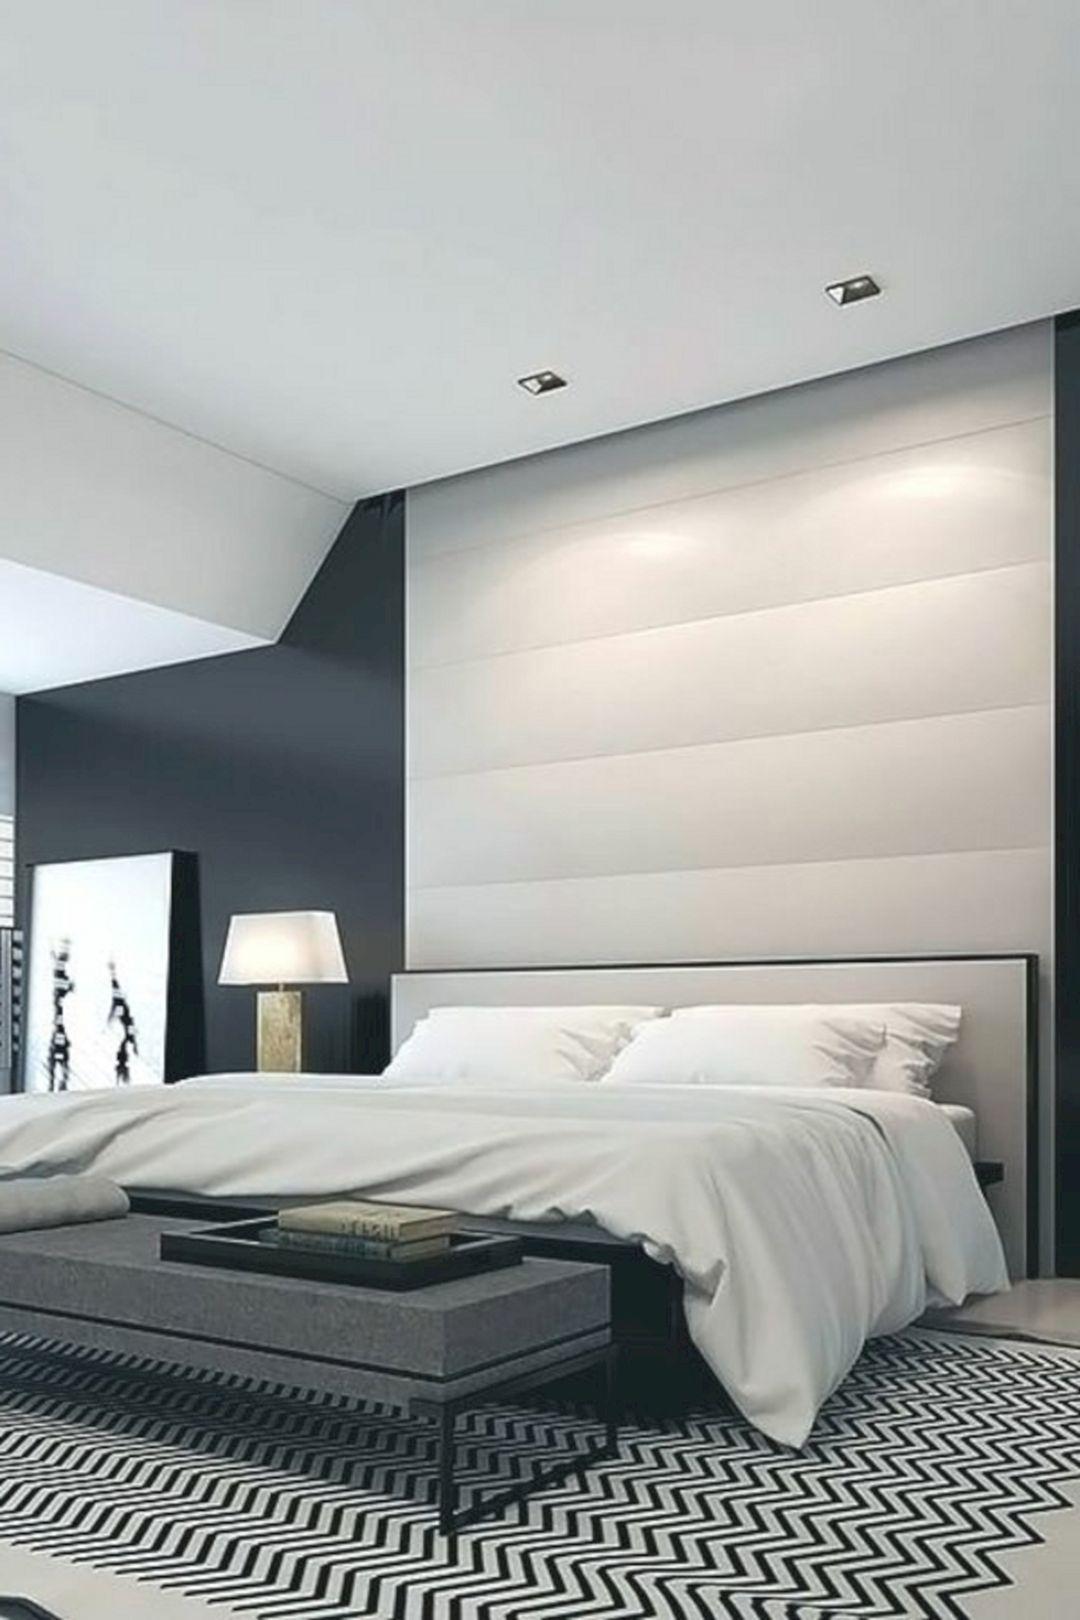 12 minimalist bedroom design ideas for cozy bedroom on cozy minimalist bedroom decorating ideas id=69920